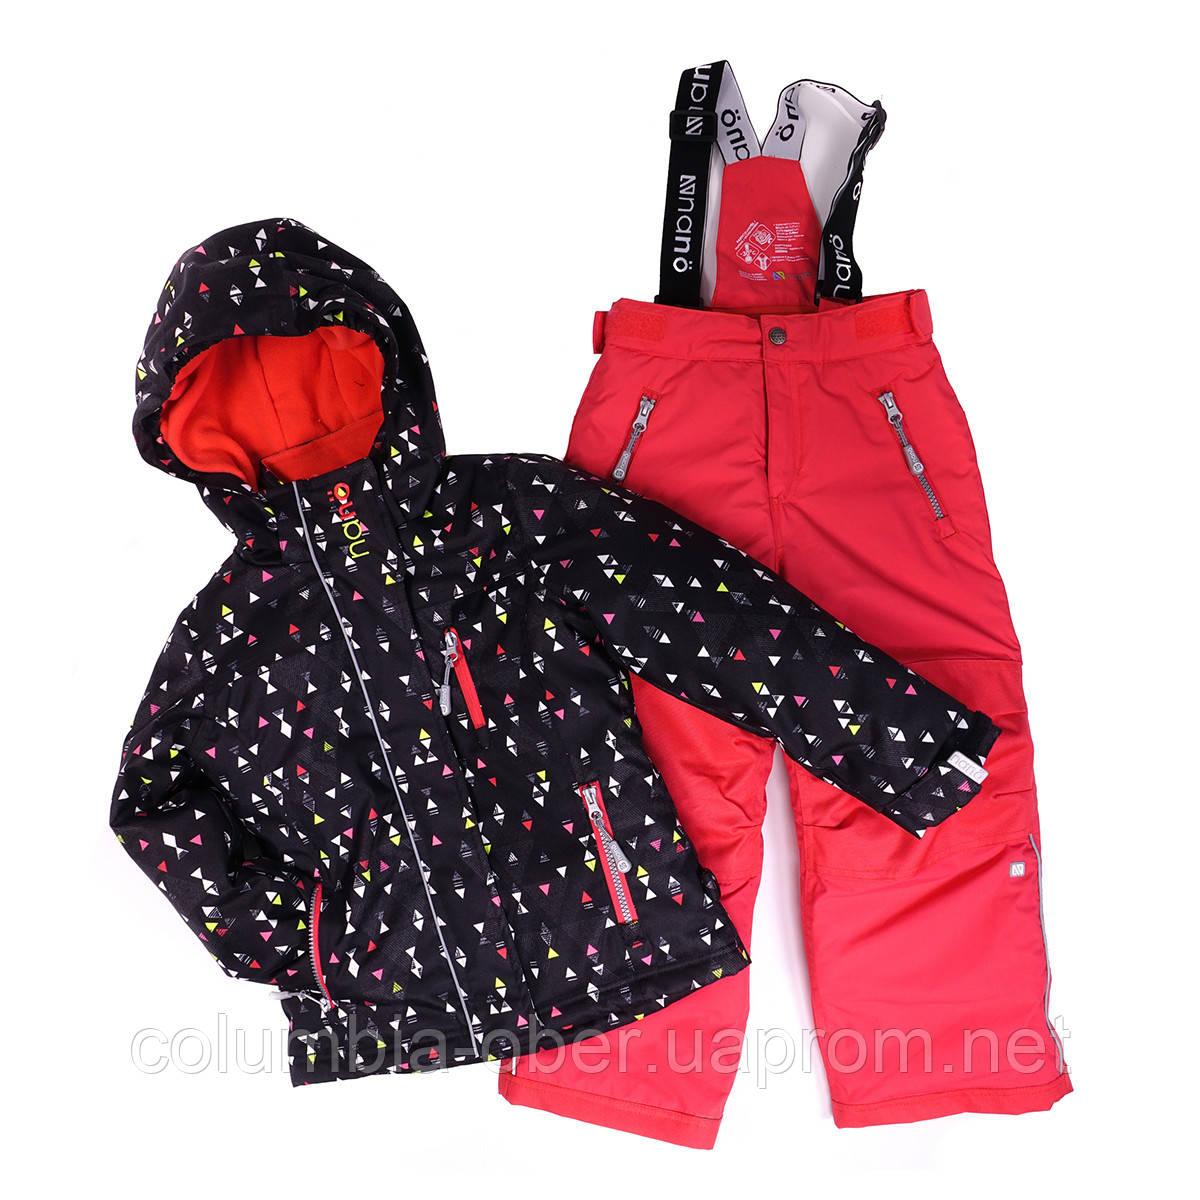 Зимний комплект для девочки NANO 266 M F16. Размеры 2 - 12.